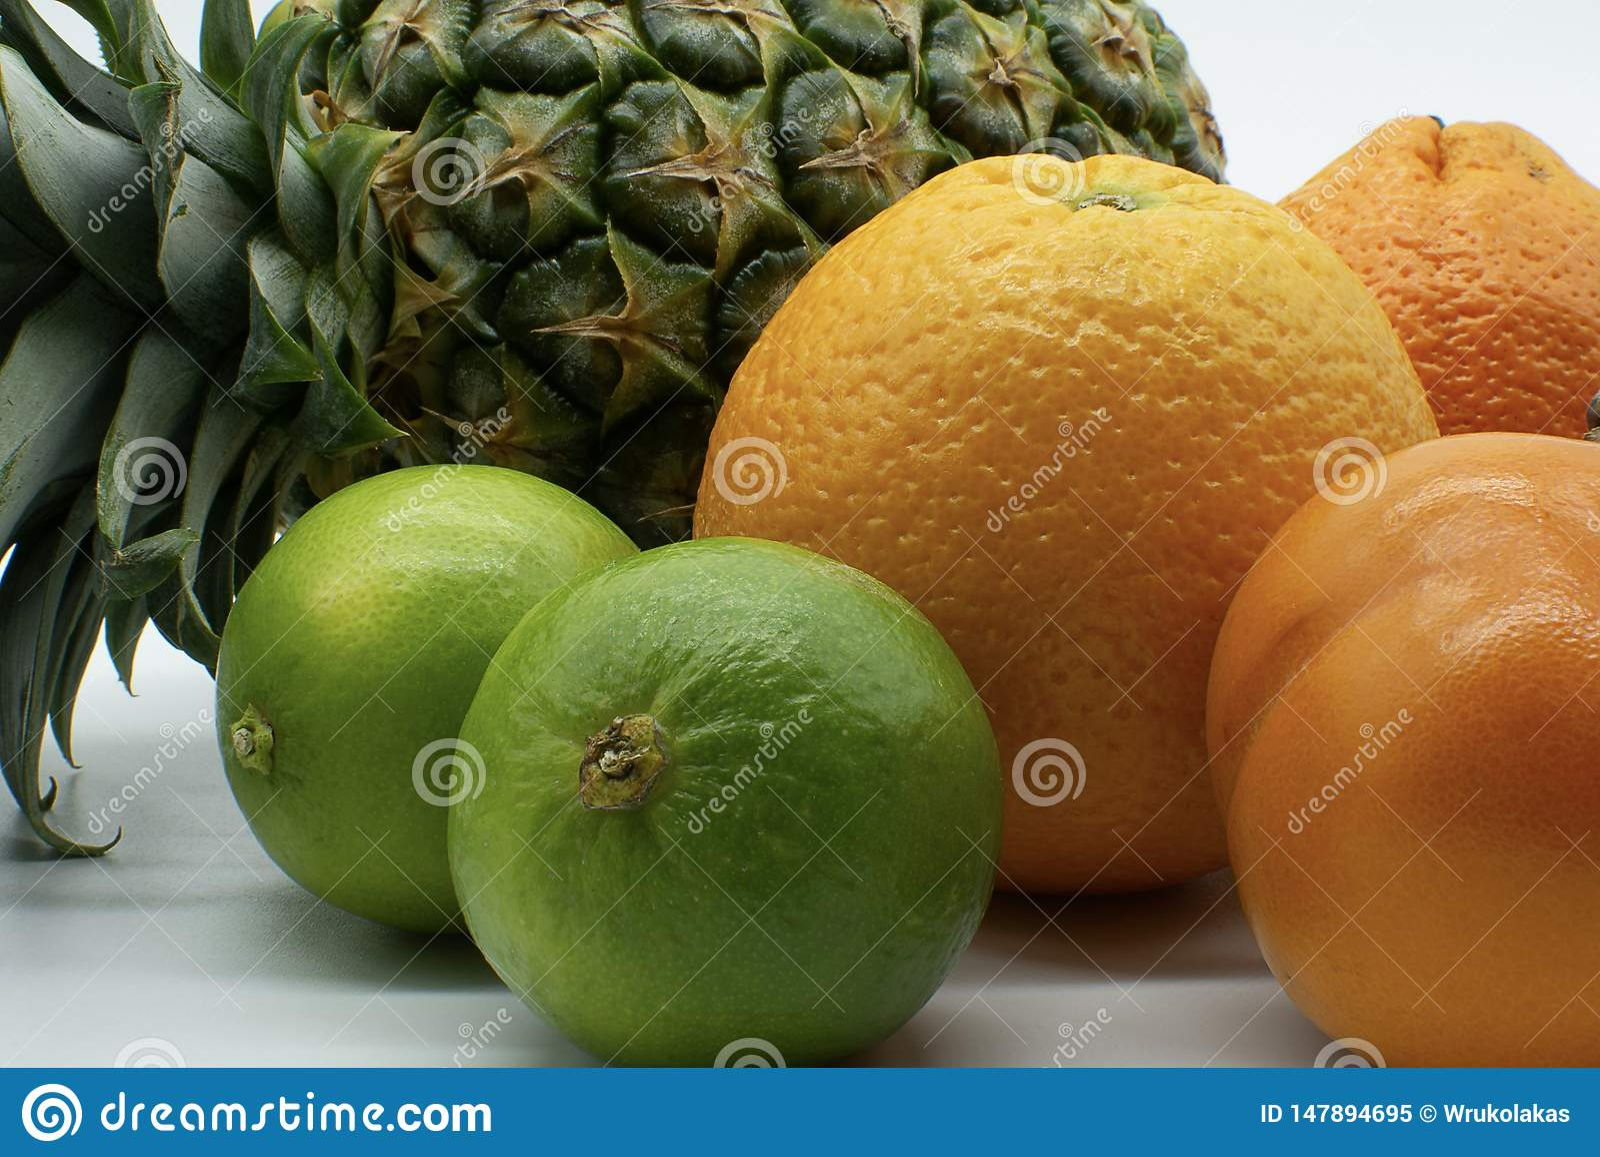 Close-up of tropical fruits